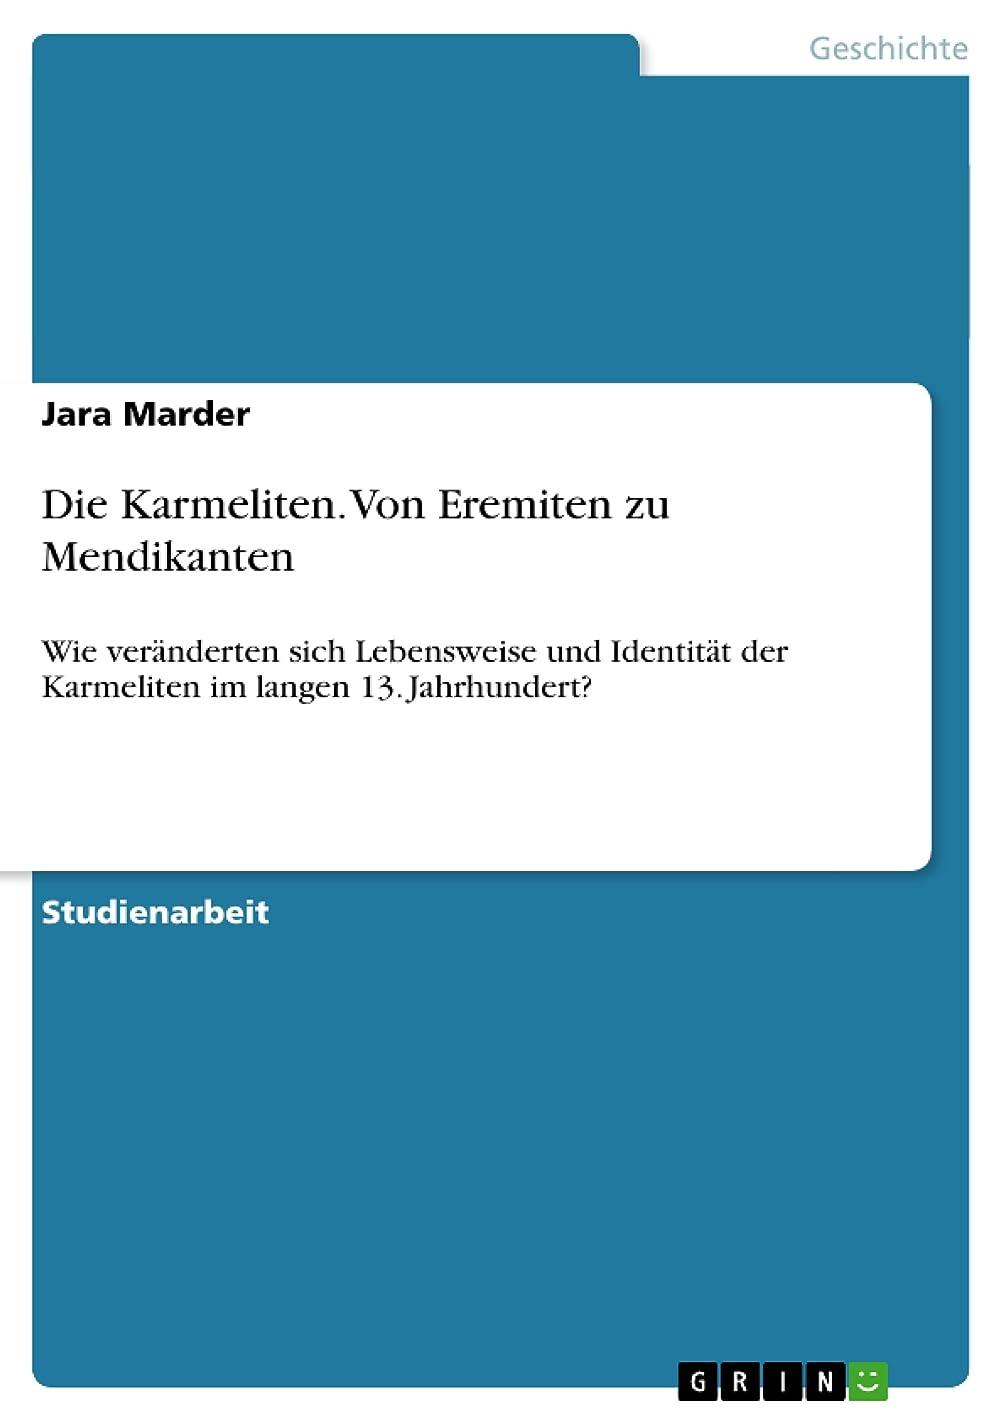 バング八百屋置換Die Karmeliten. Von Eremiten zu Mendikanten: Wie ver?nderten sich Lebensweise und Identit?t der Karmeliten im langen 13. Jahrhundert? (German Edition)